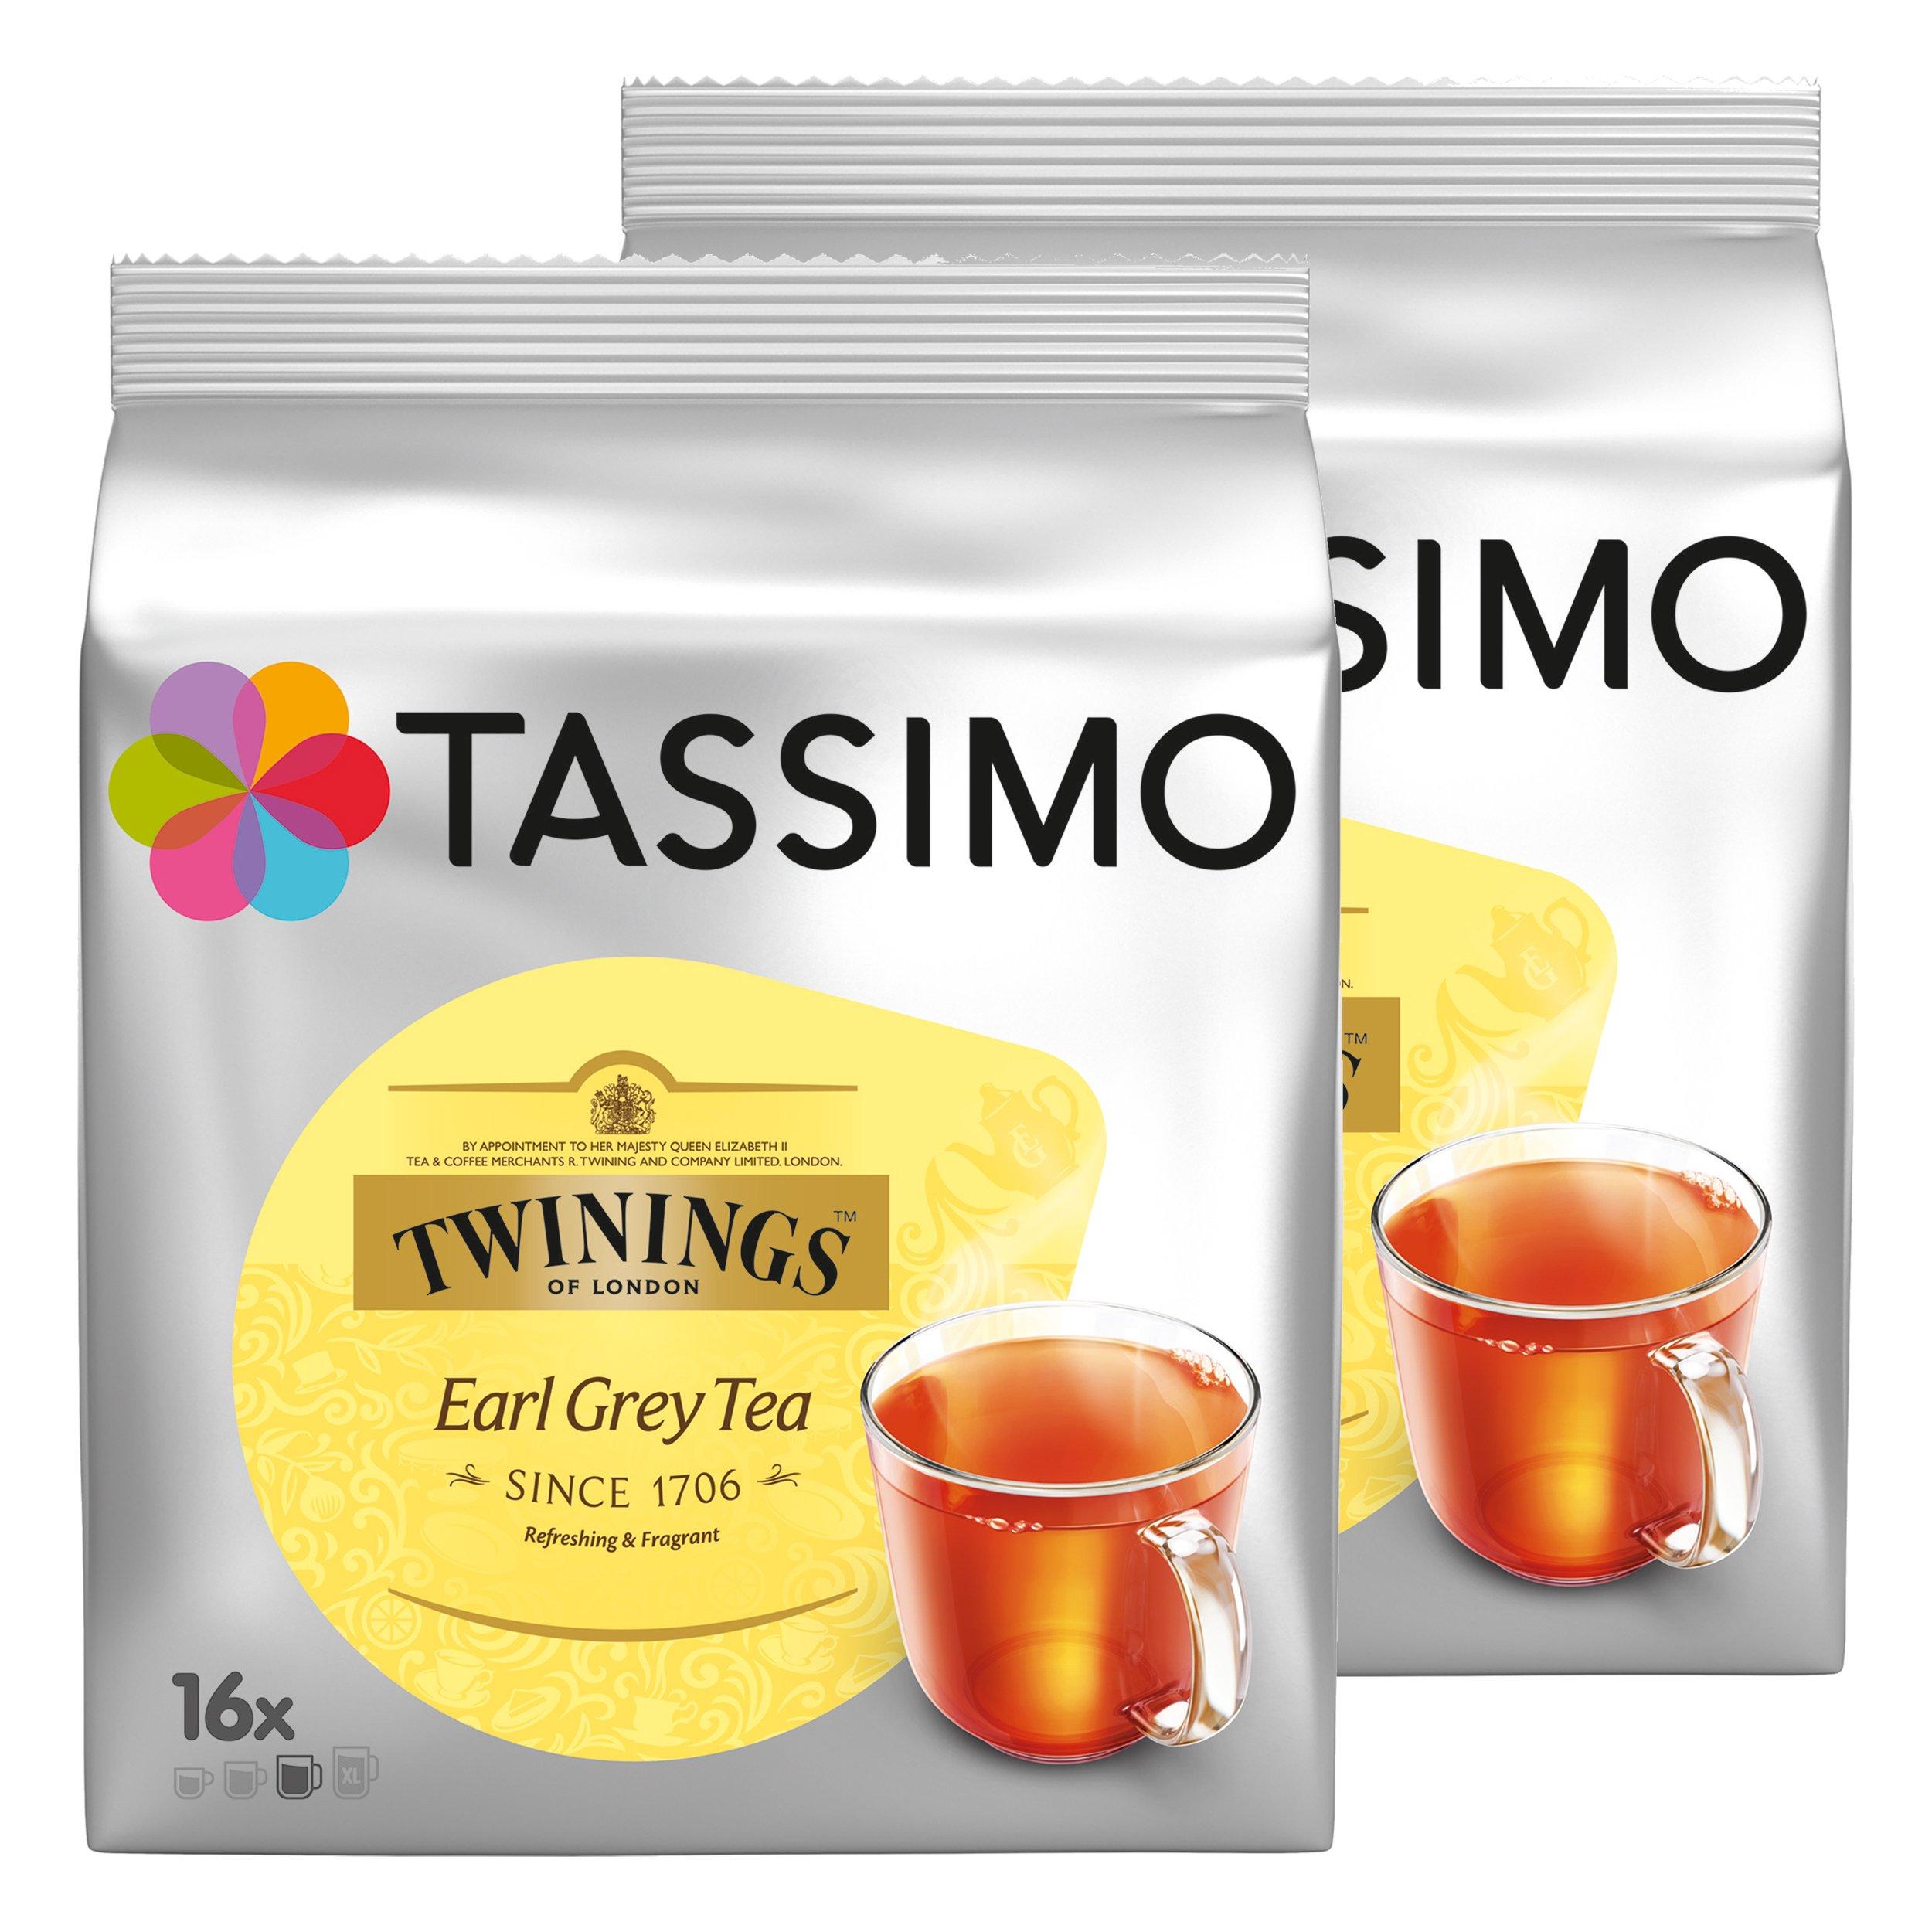 Tassimo-Twinings-Earl-Grey-Tee-Schwarzer-Tee-Schwarztee-Kapsel-2er-Pack-2-x-16-T-Discs